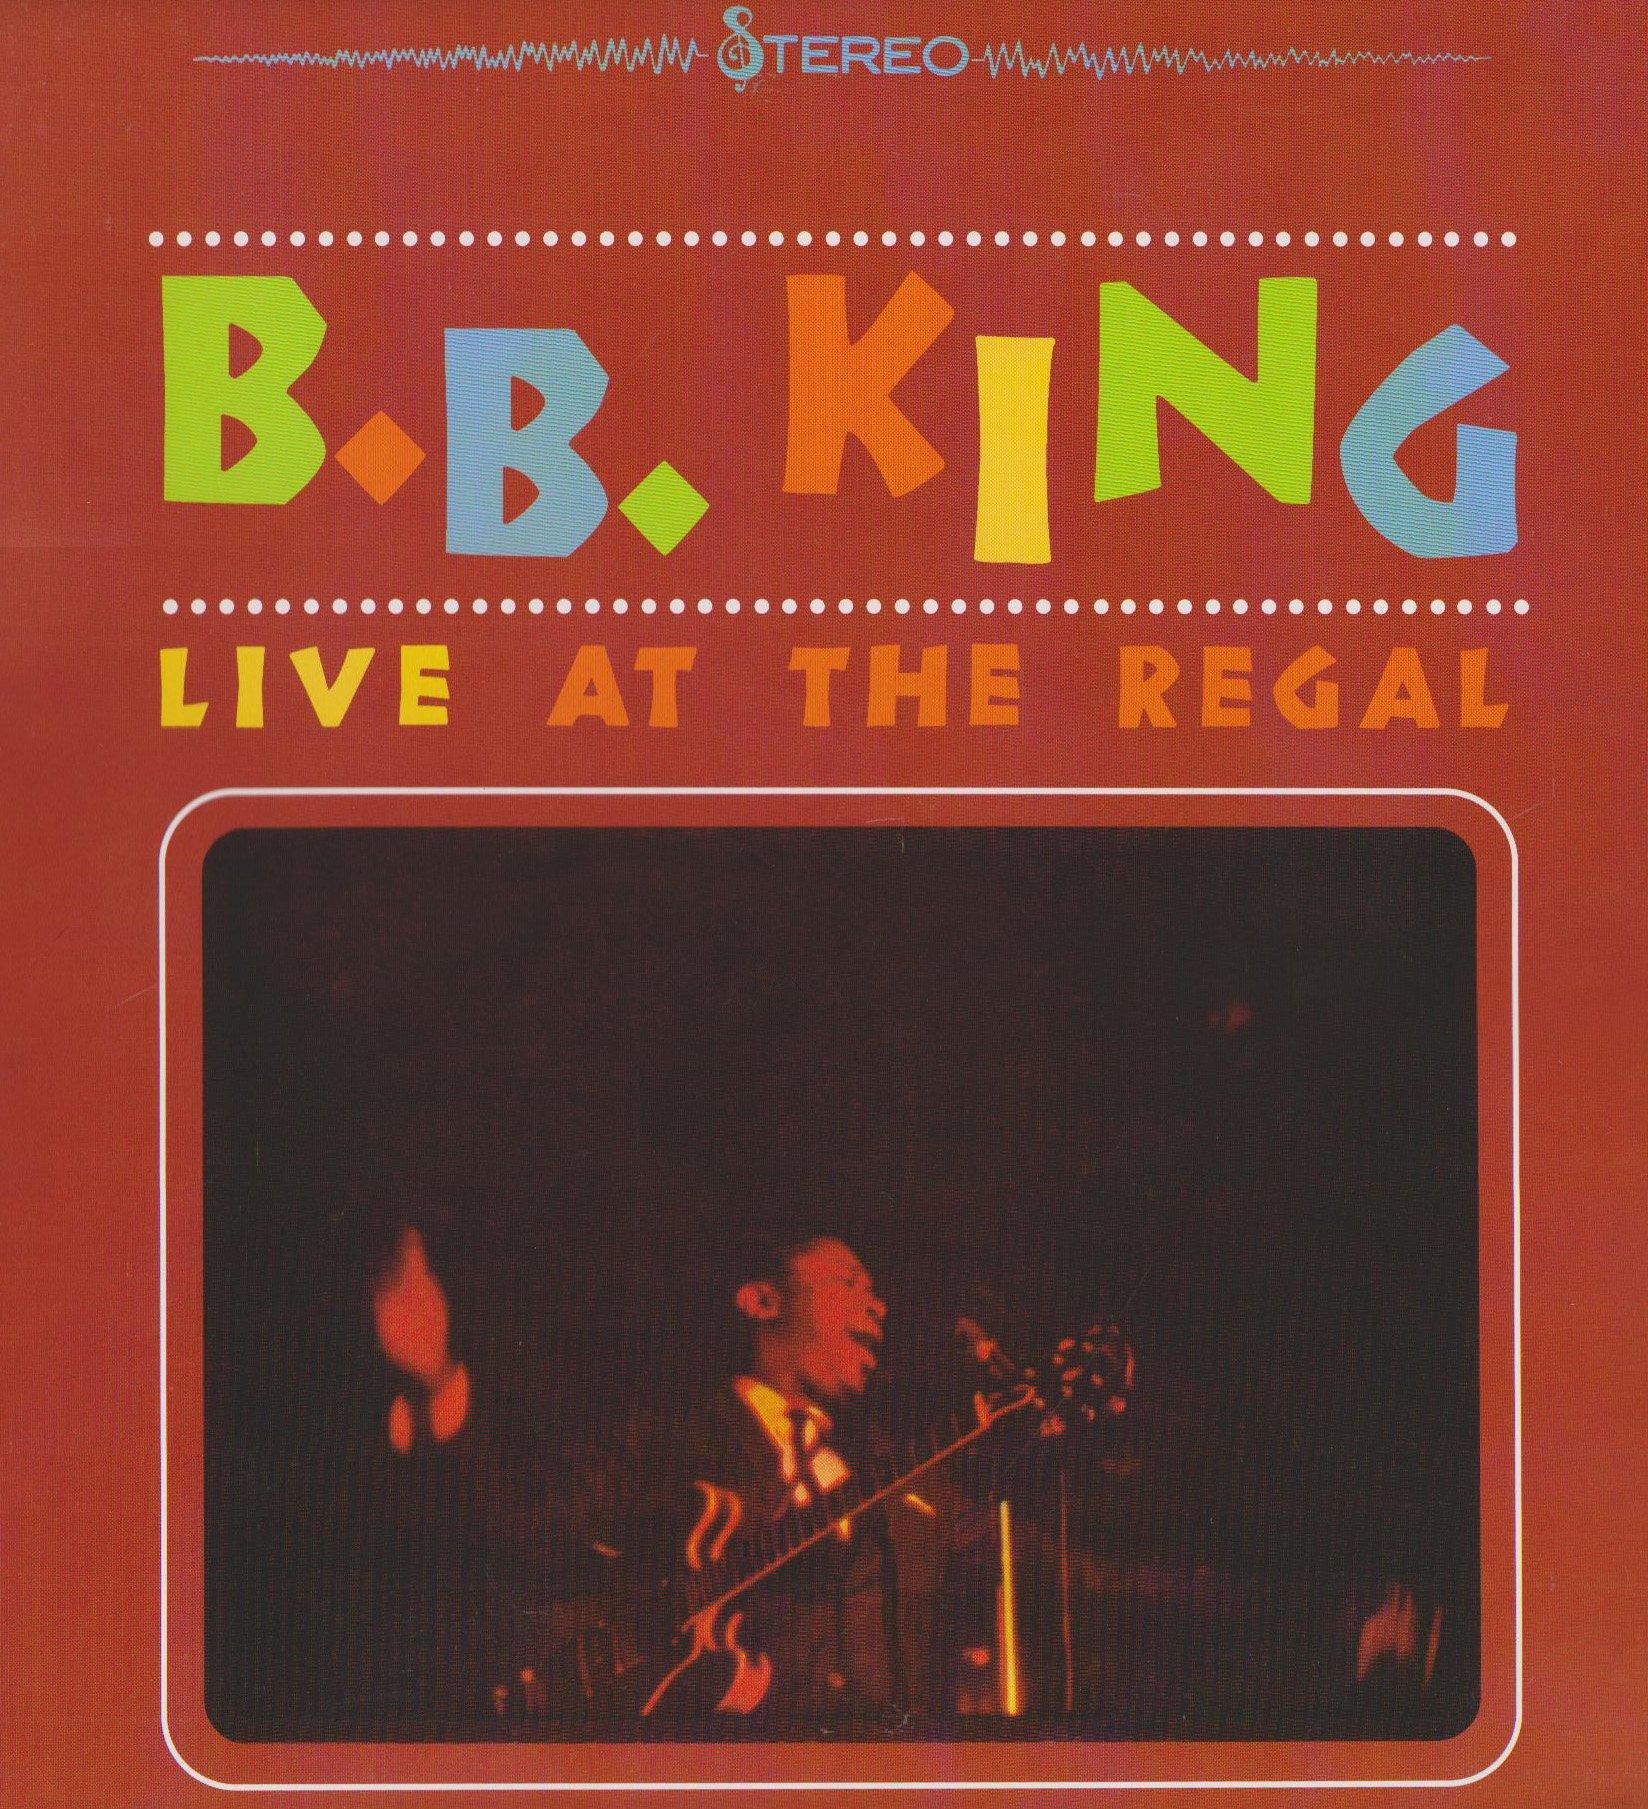 Live At The Regal [Vinyl] by VINYL